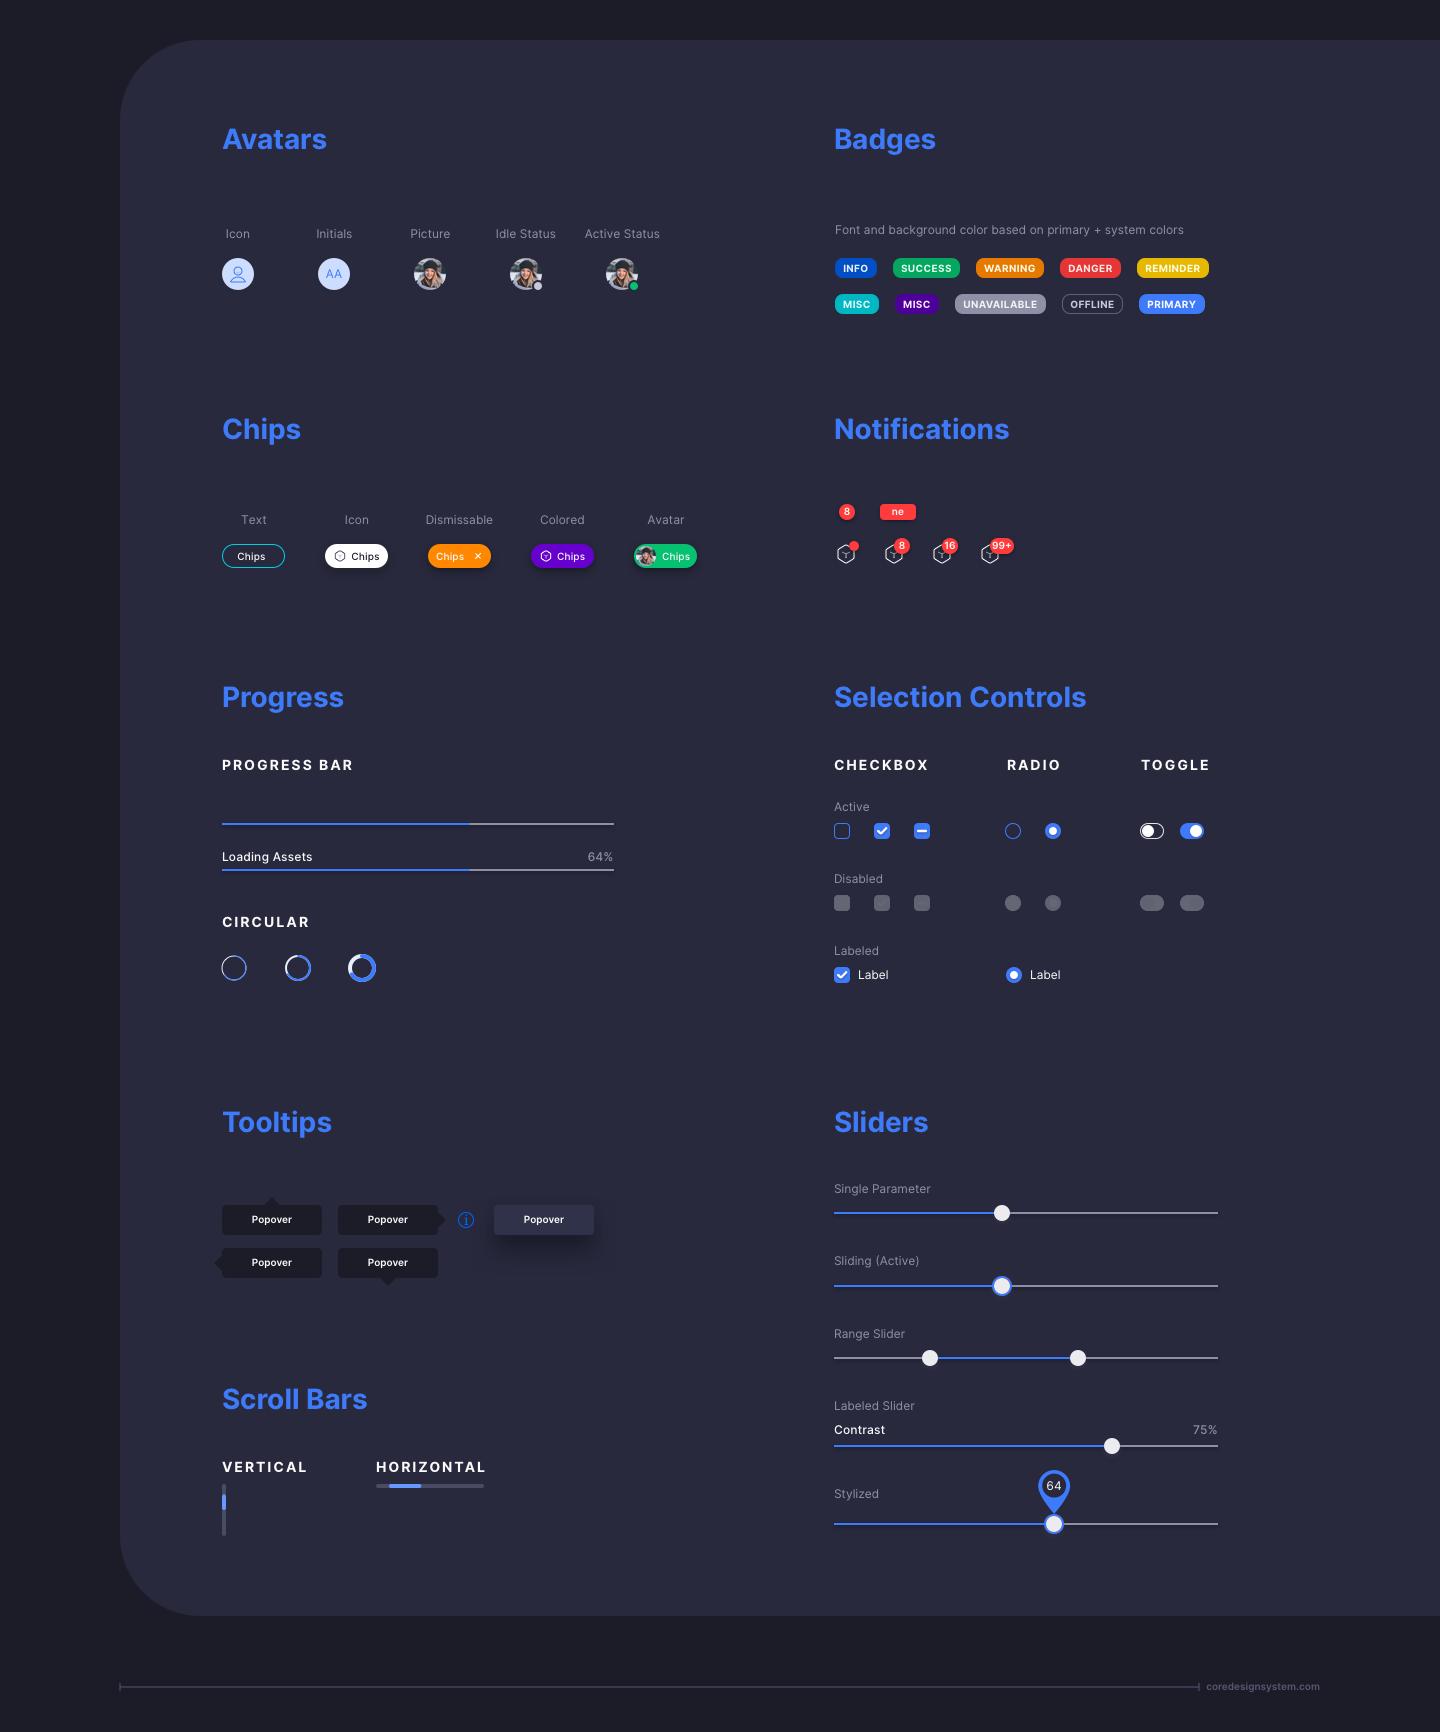 Avatars UI Component in dark theme